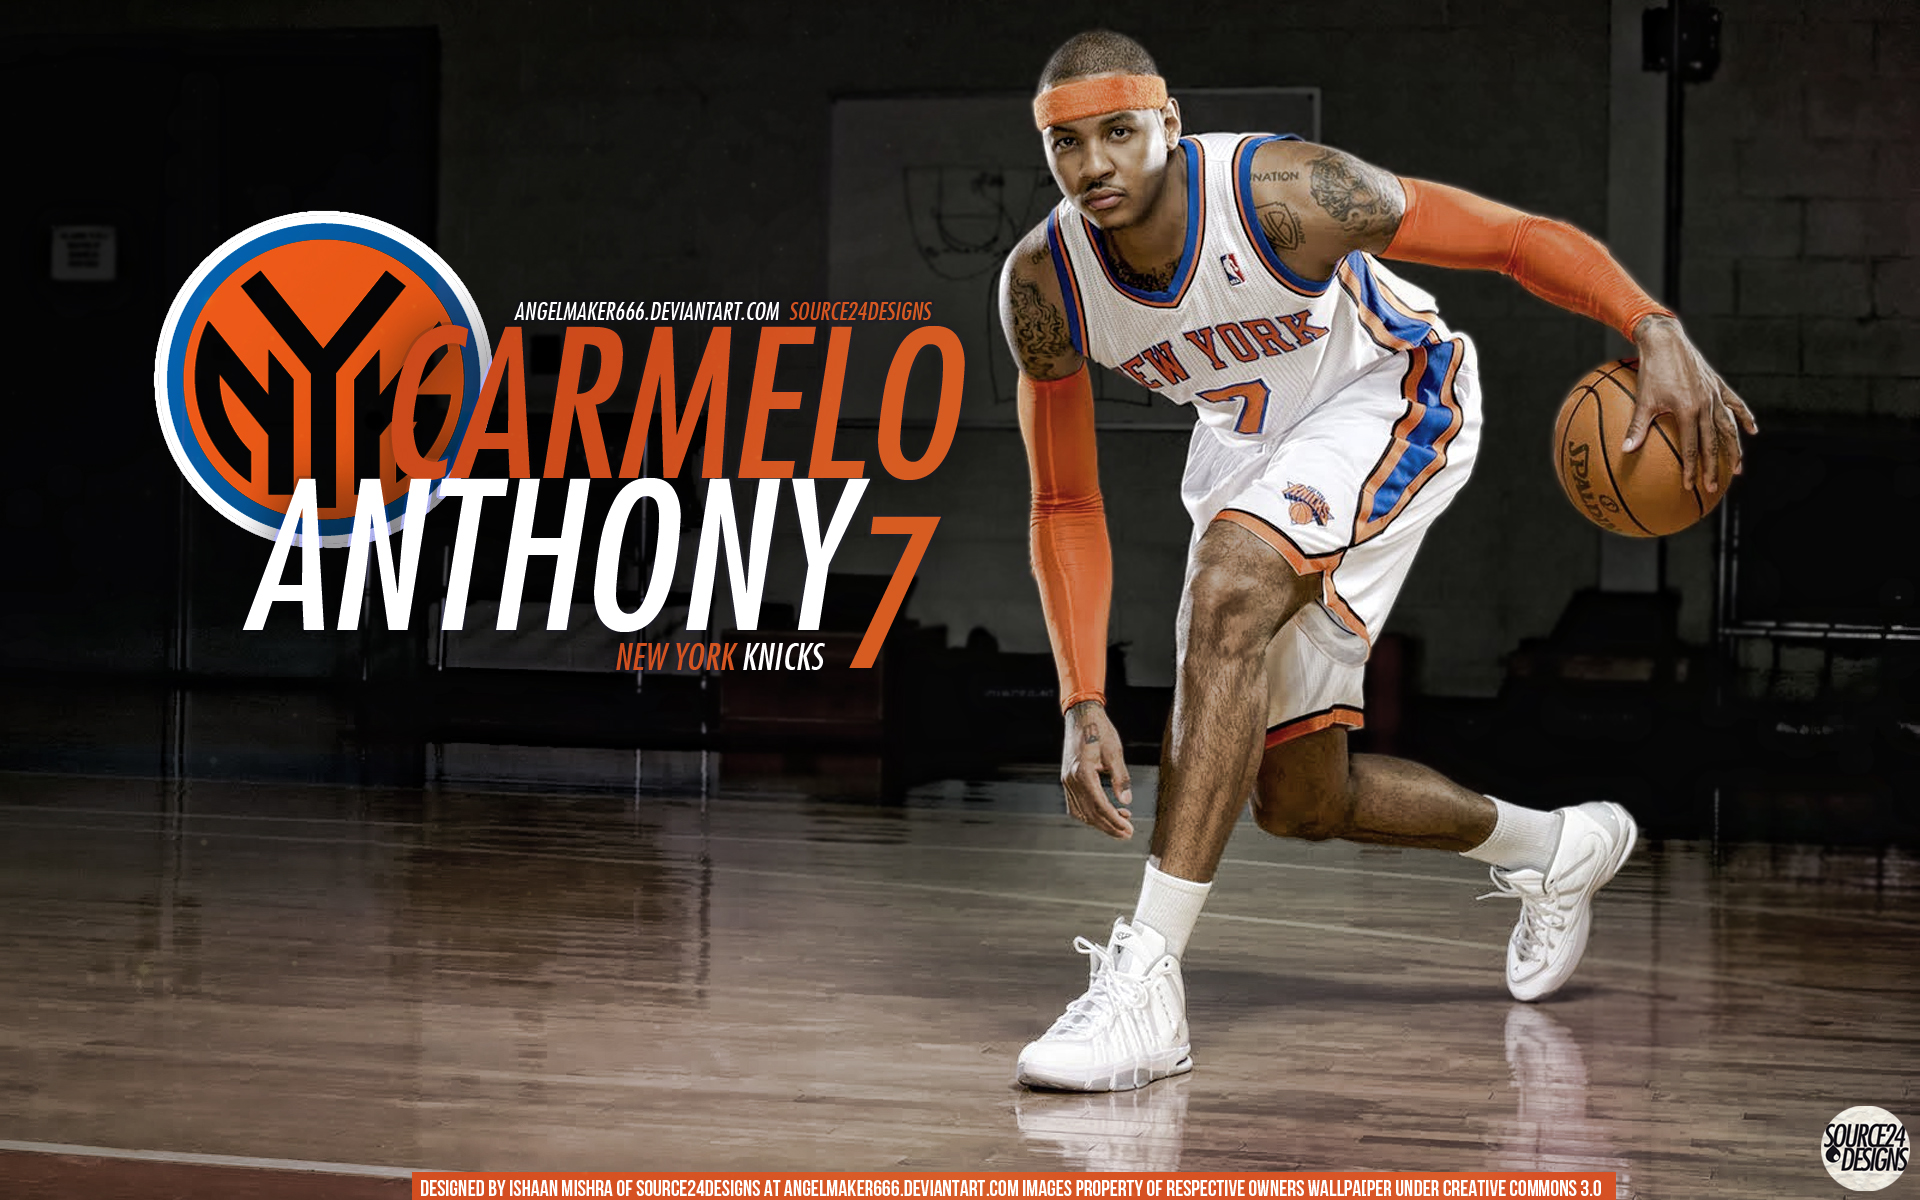 Carmelo Anthony Wallpaper Knicks - WallpaperSafari